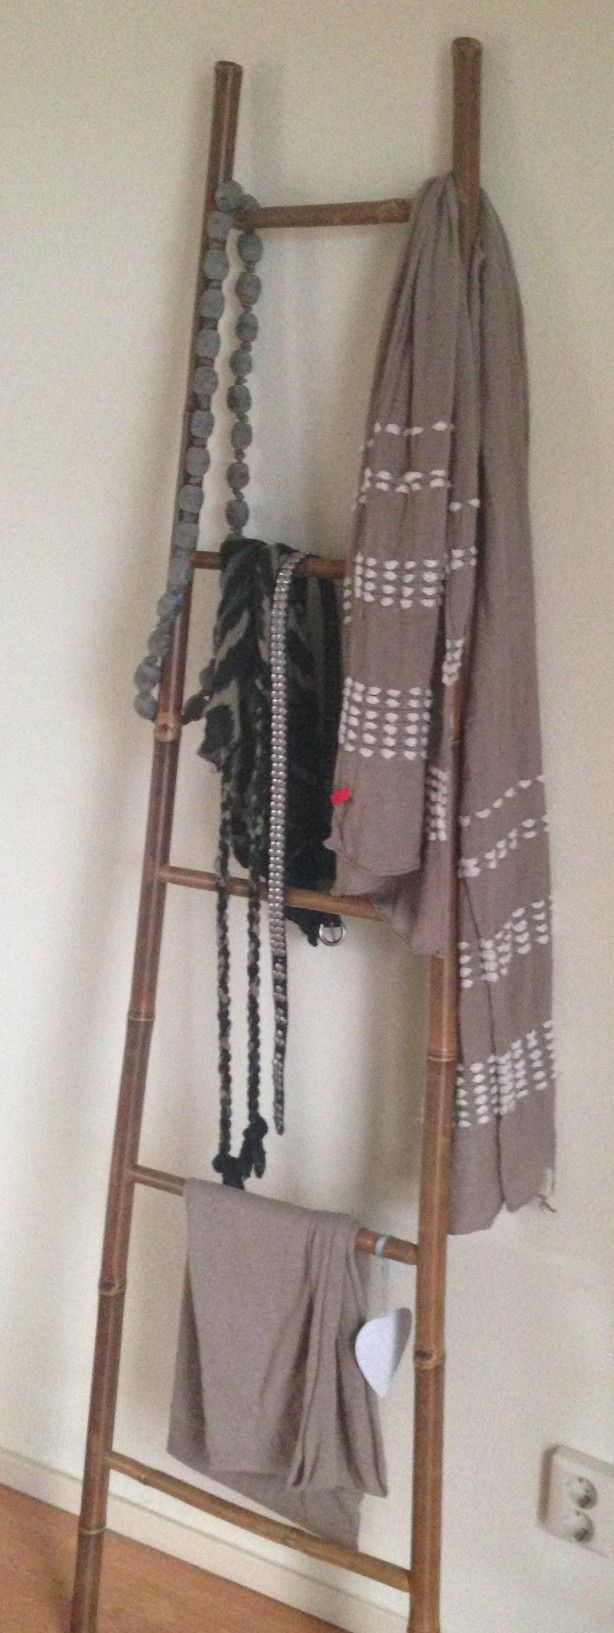 Badkameraccessoires Geel ~   over Bamboe Ladders op Pinterest  Bamboe, Ladders en Bamboe Ambachten